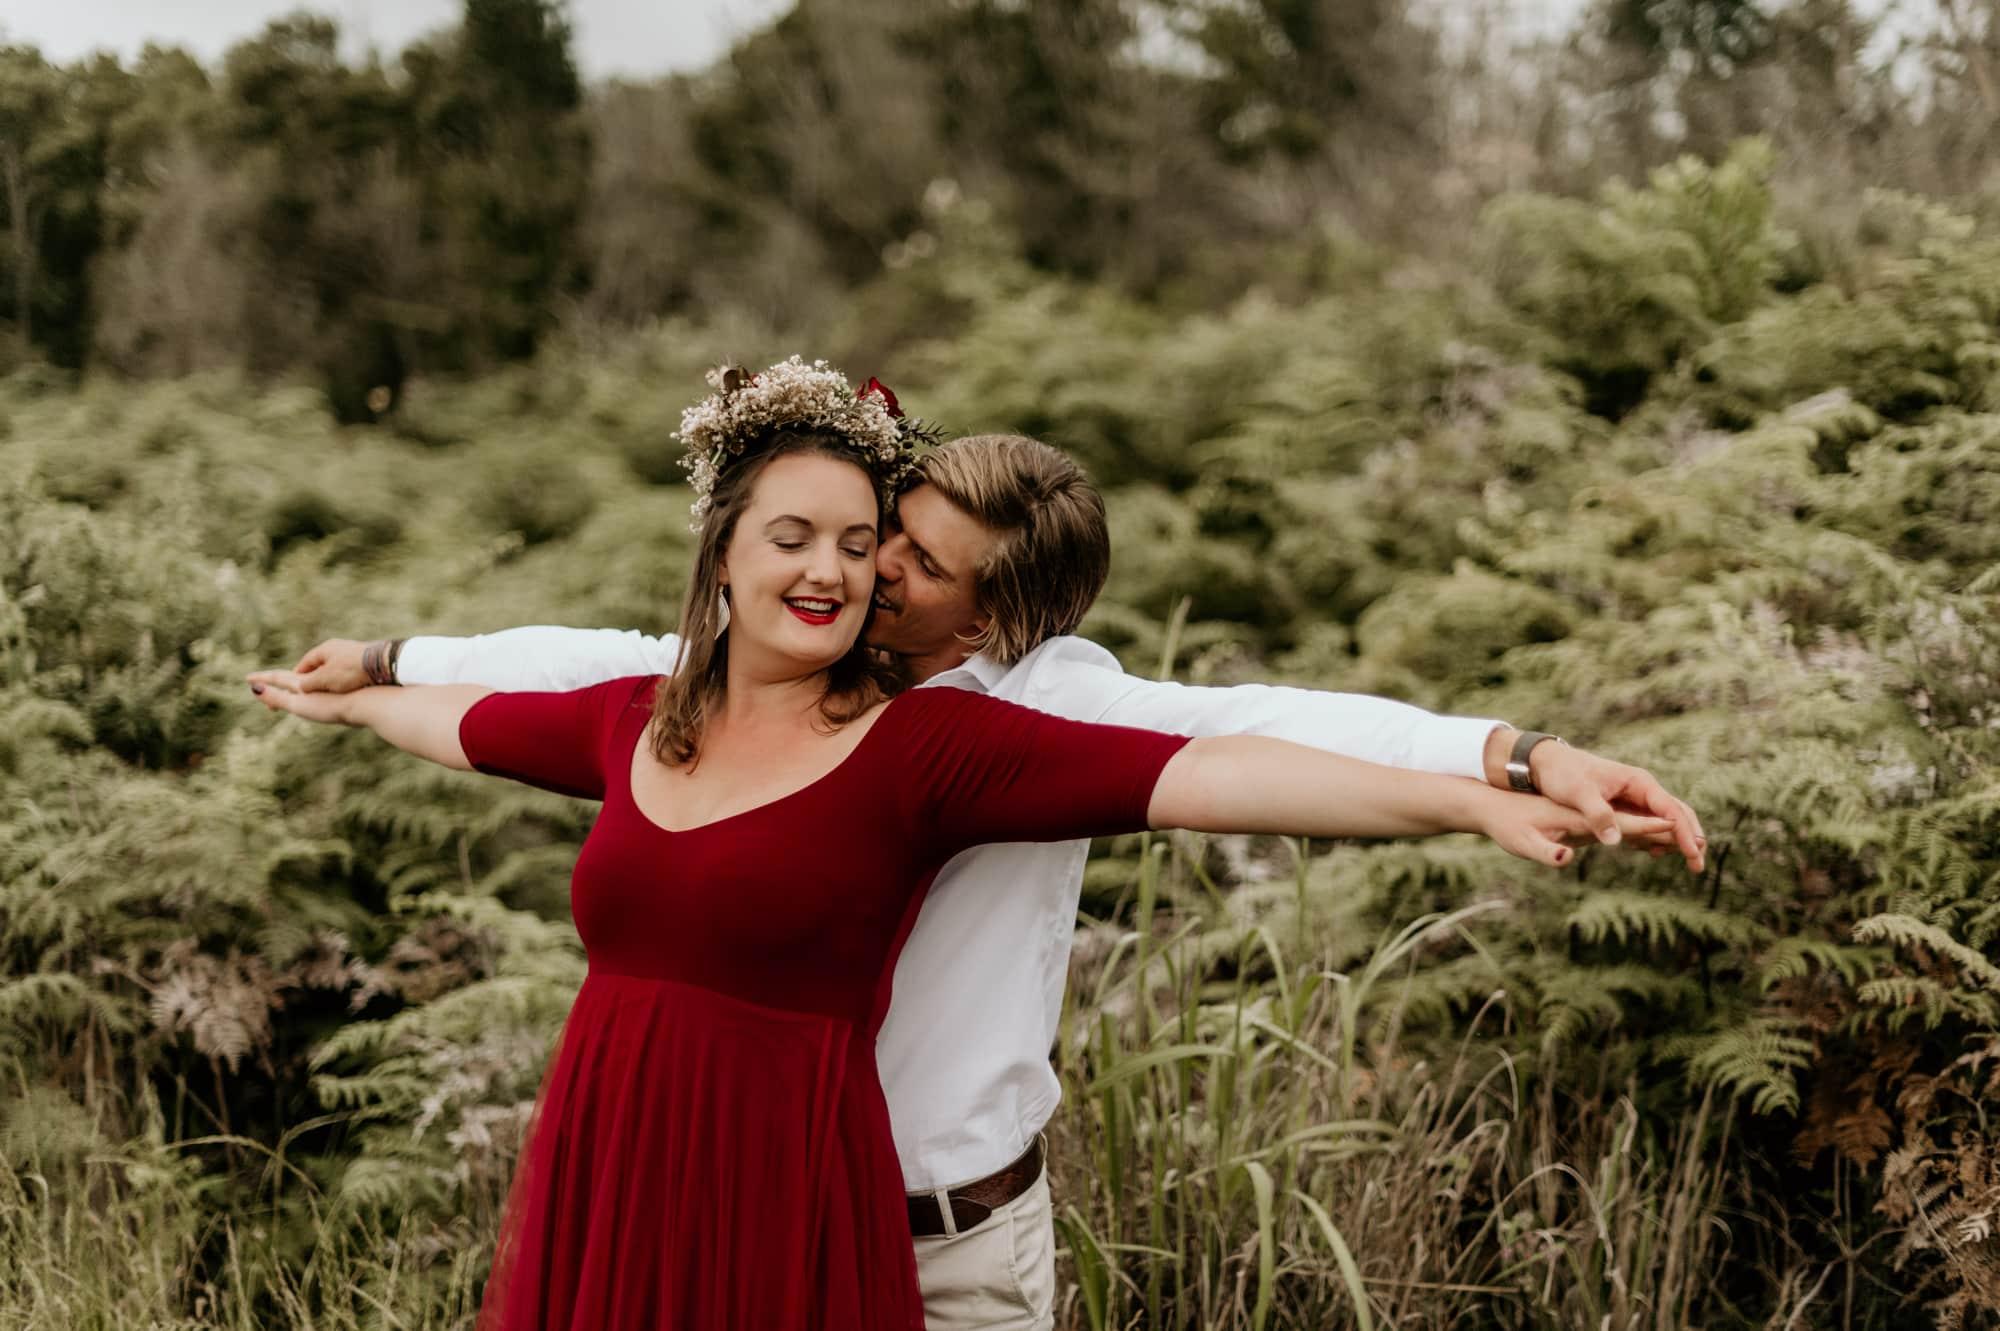 wesley-lanie-george-fernridge-engagement-June-Richards-Photography-Destination-Weddings-Elopements-Garden-Route-02